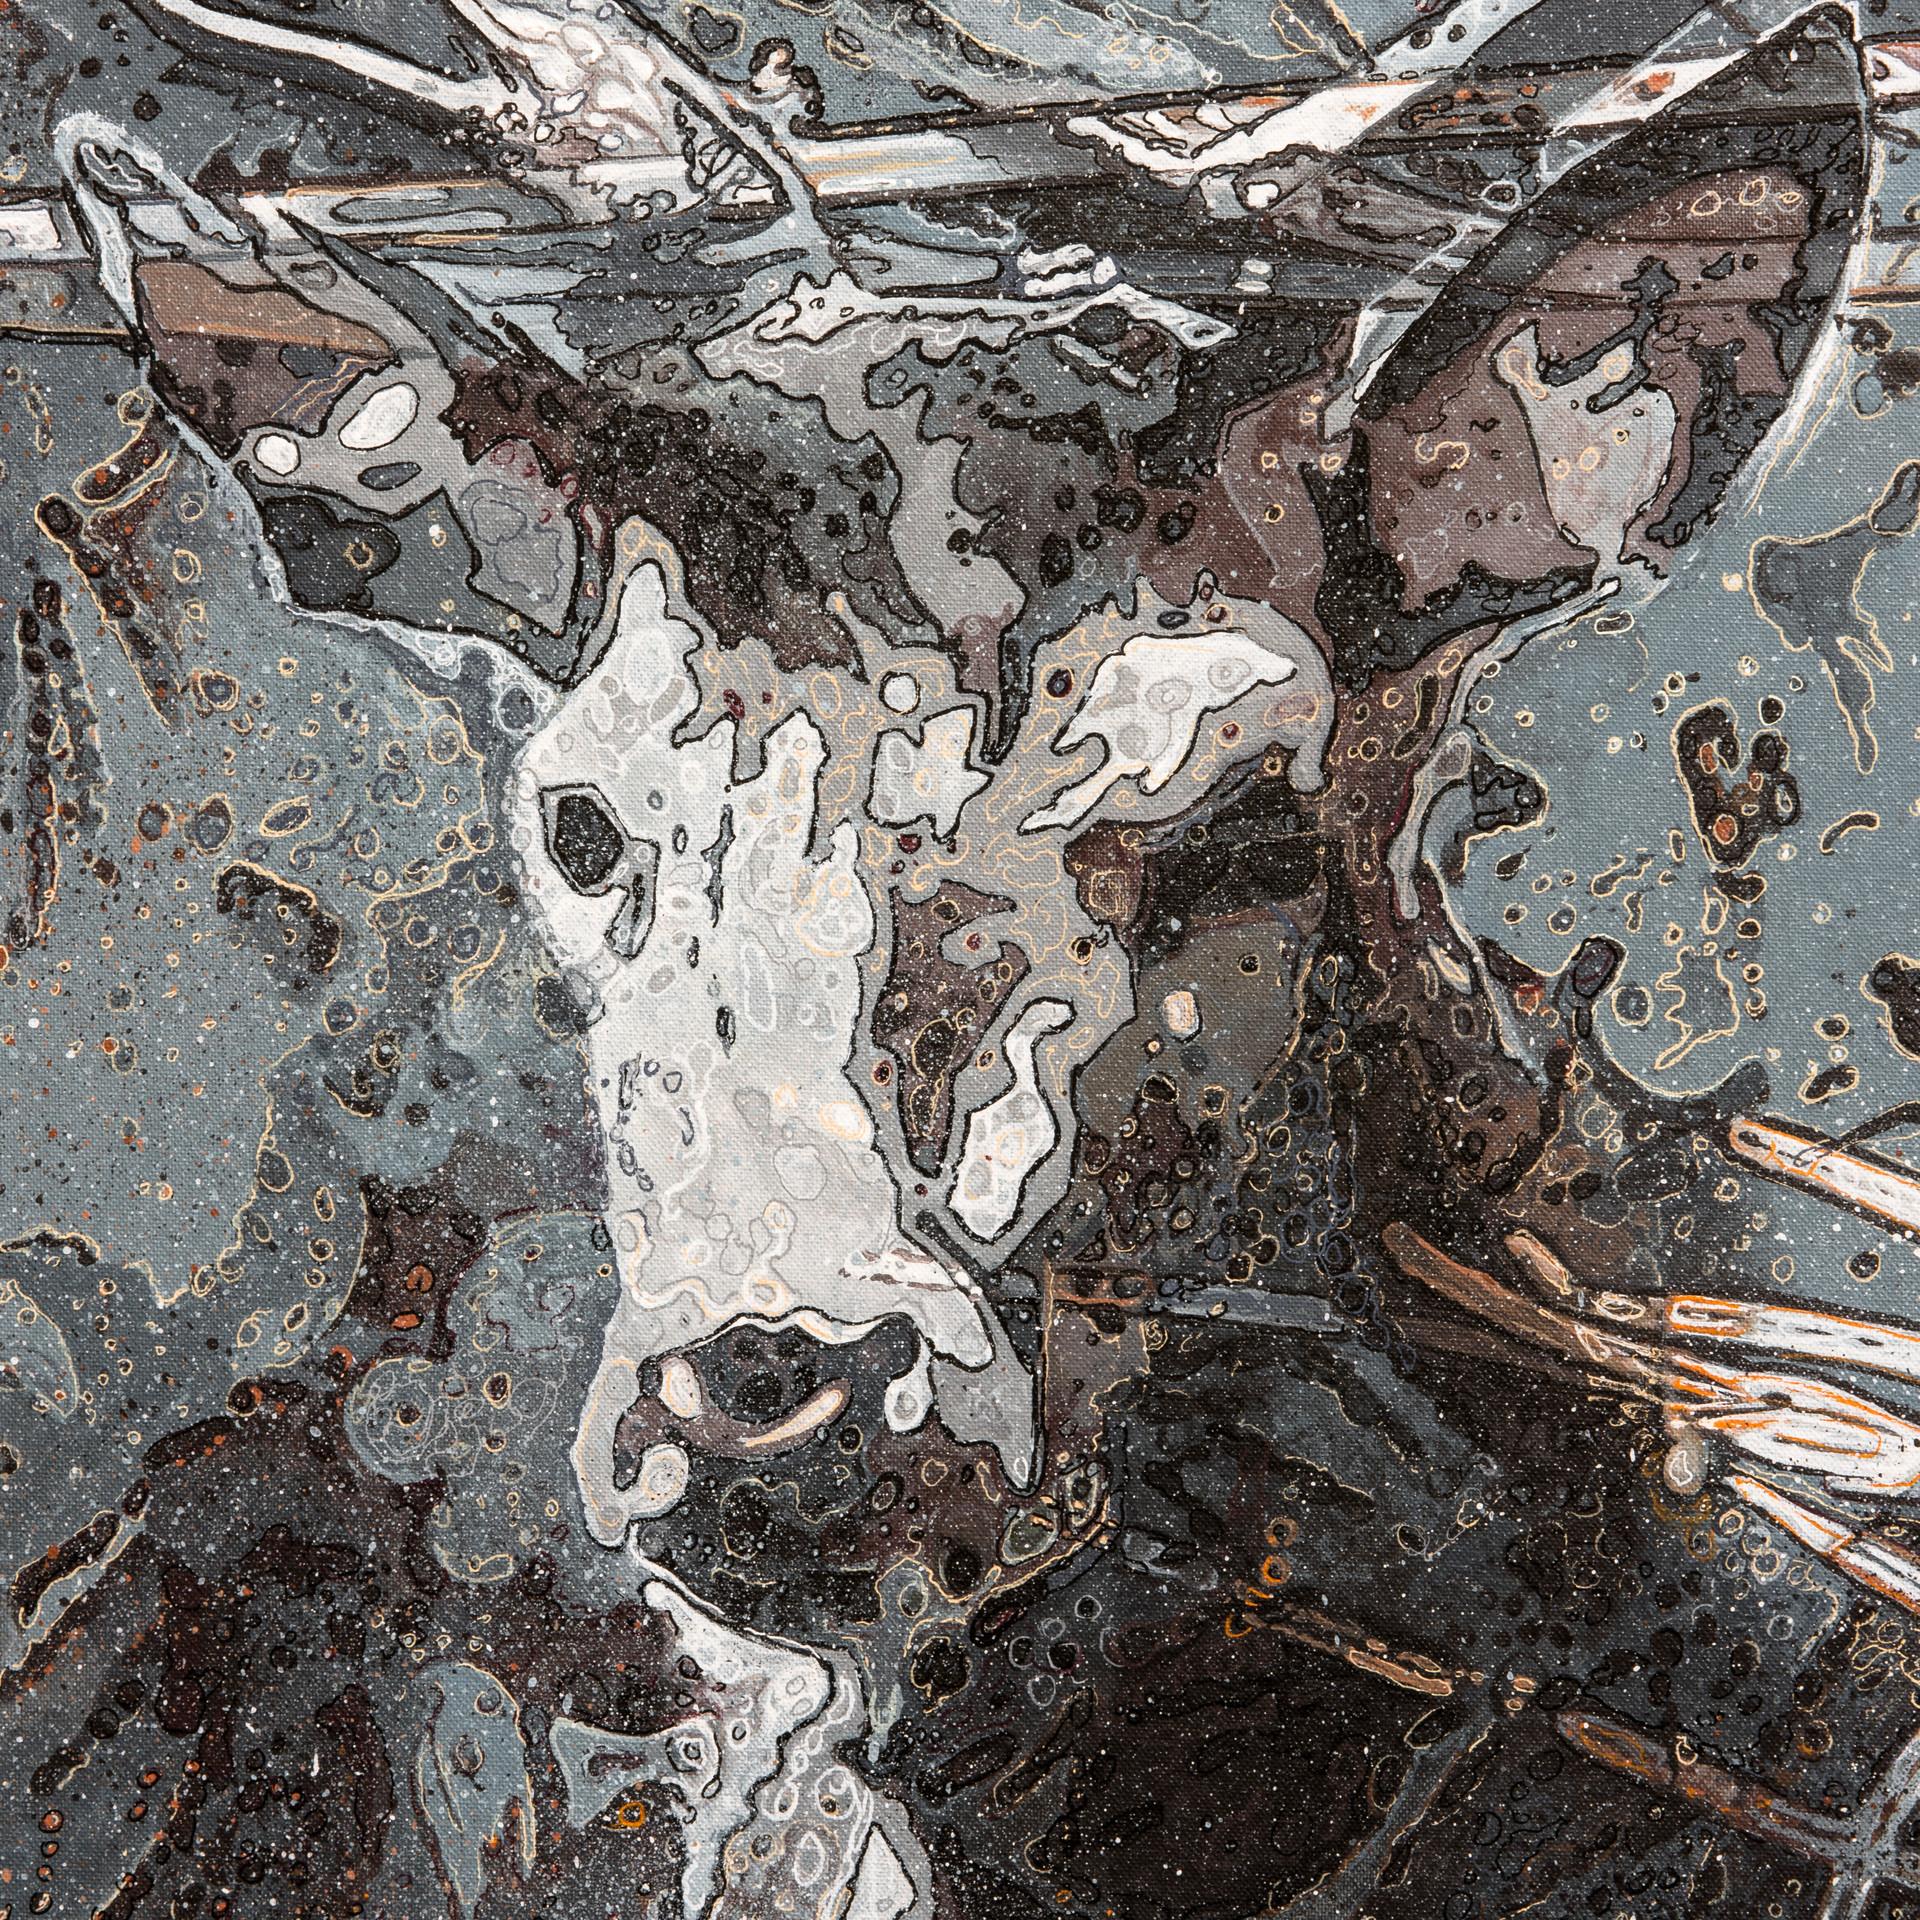 Detail: My sweet Botticelli, 2020